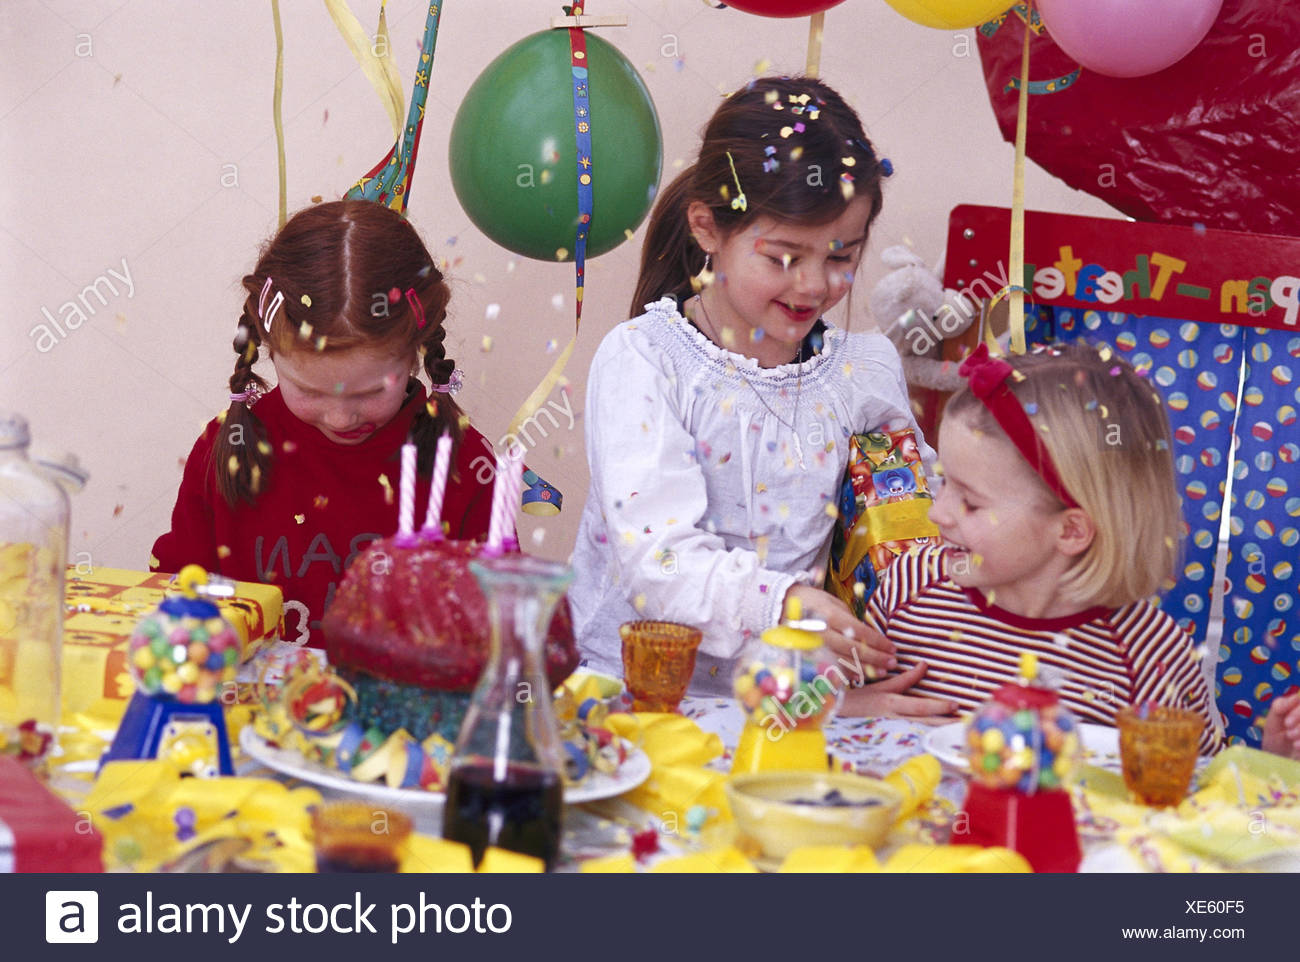 Childrens birthday party girl congratulate birthday boy